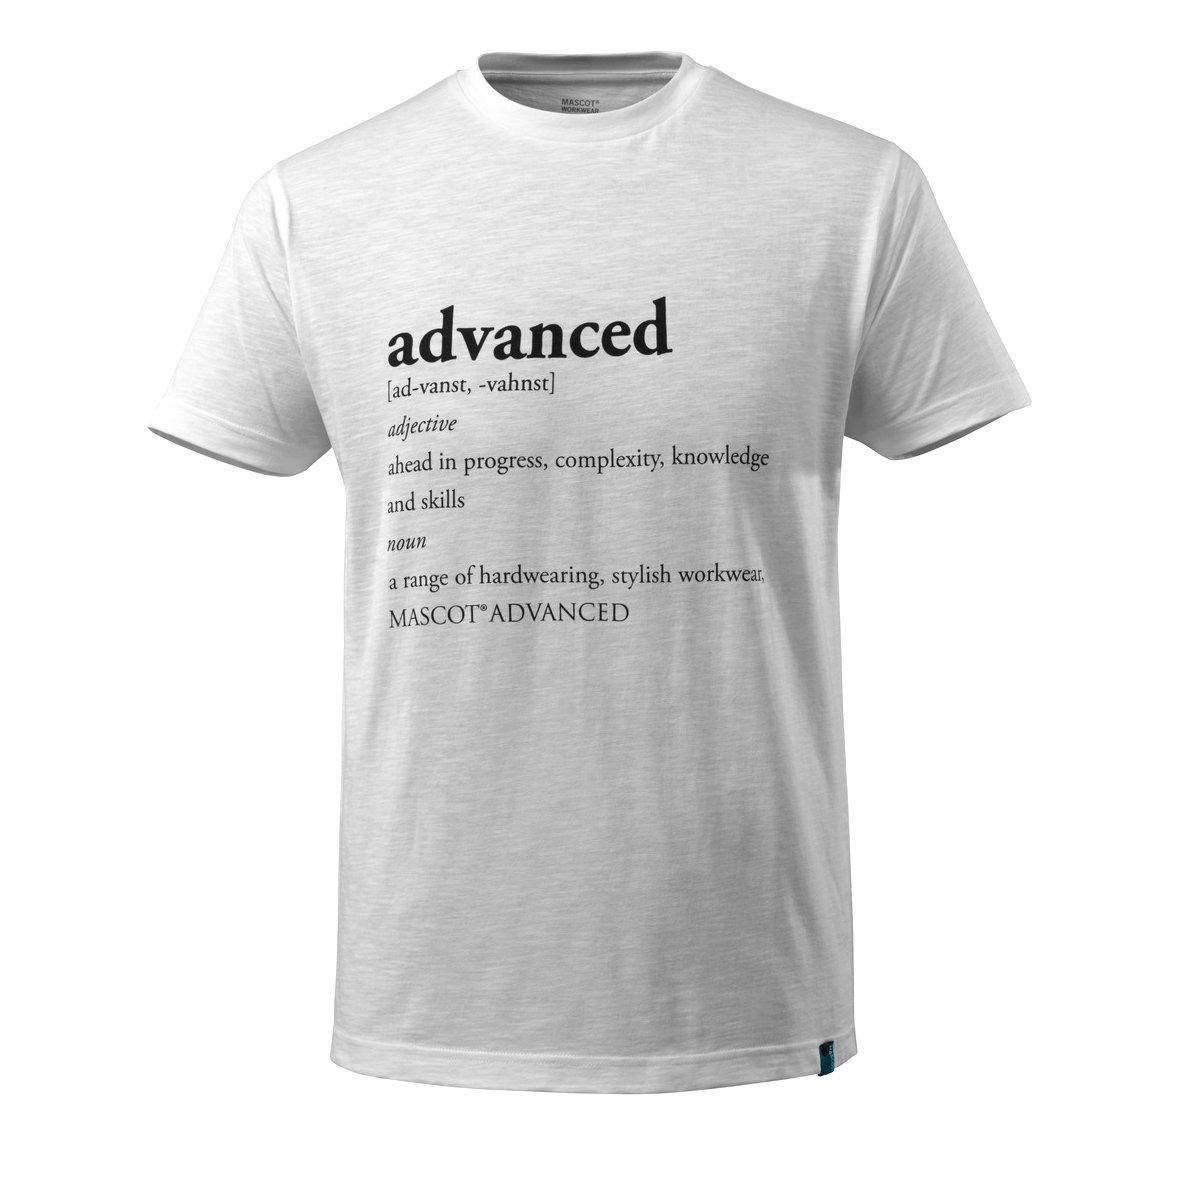 3XL Advanced Mascot 17181-983 T-ShirtAdvanced Text Wei/ß